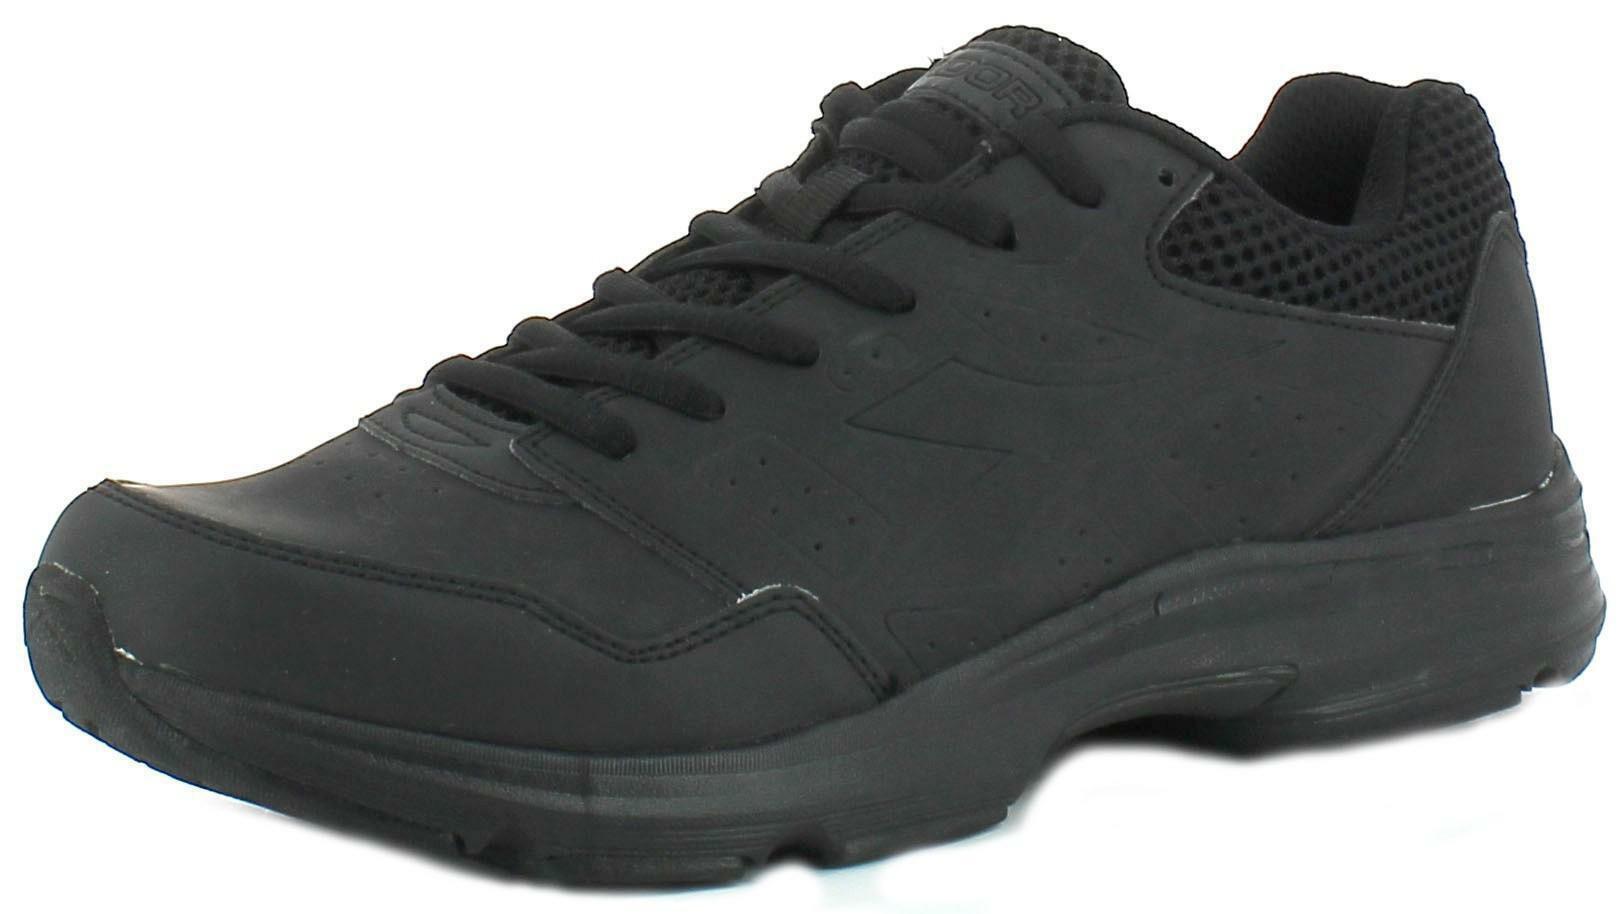 diadora diadora shape 6 sl scarpe sportive uomo nere pelle